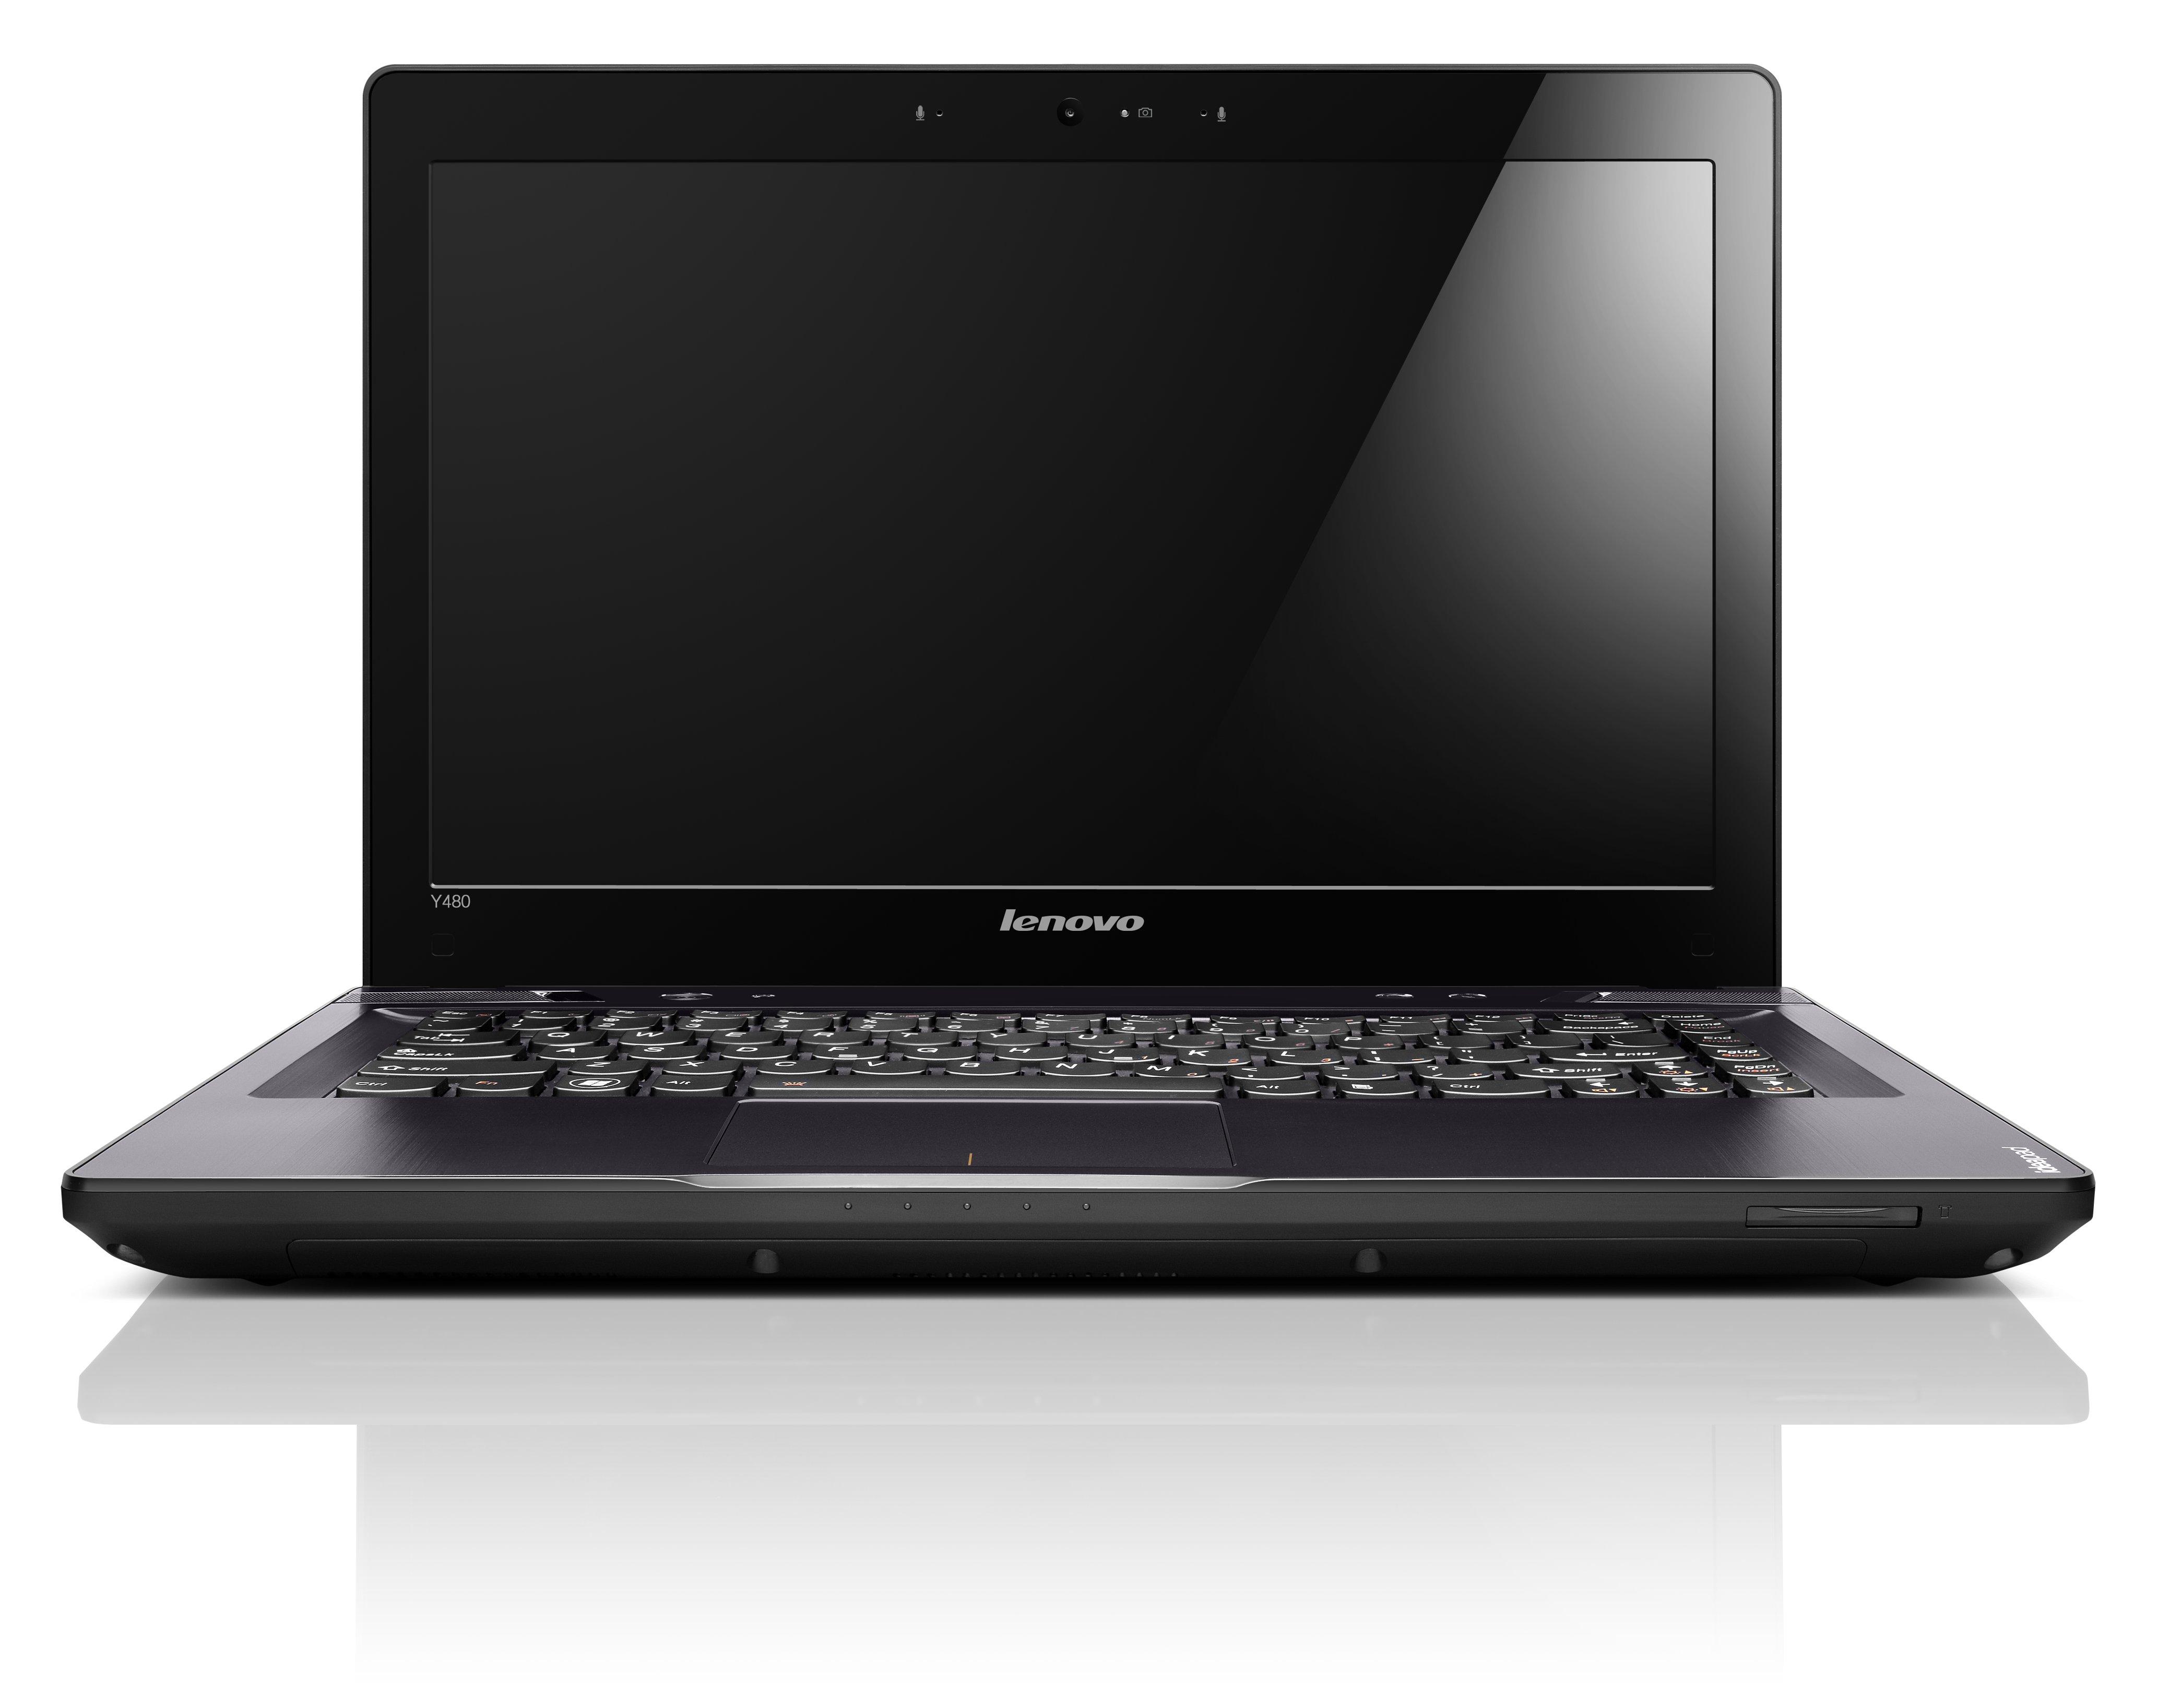 Lenovo Announces Ideapad Y480 And Y580 Laptops